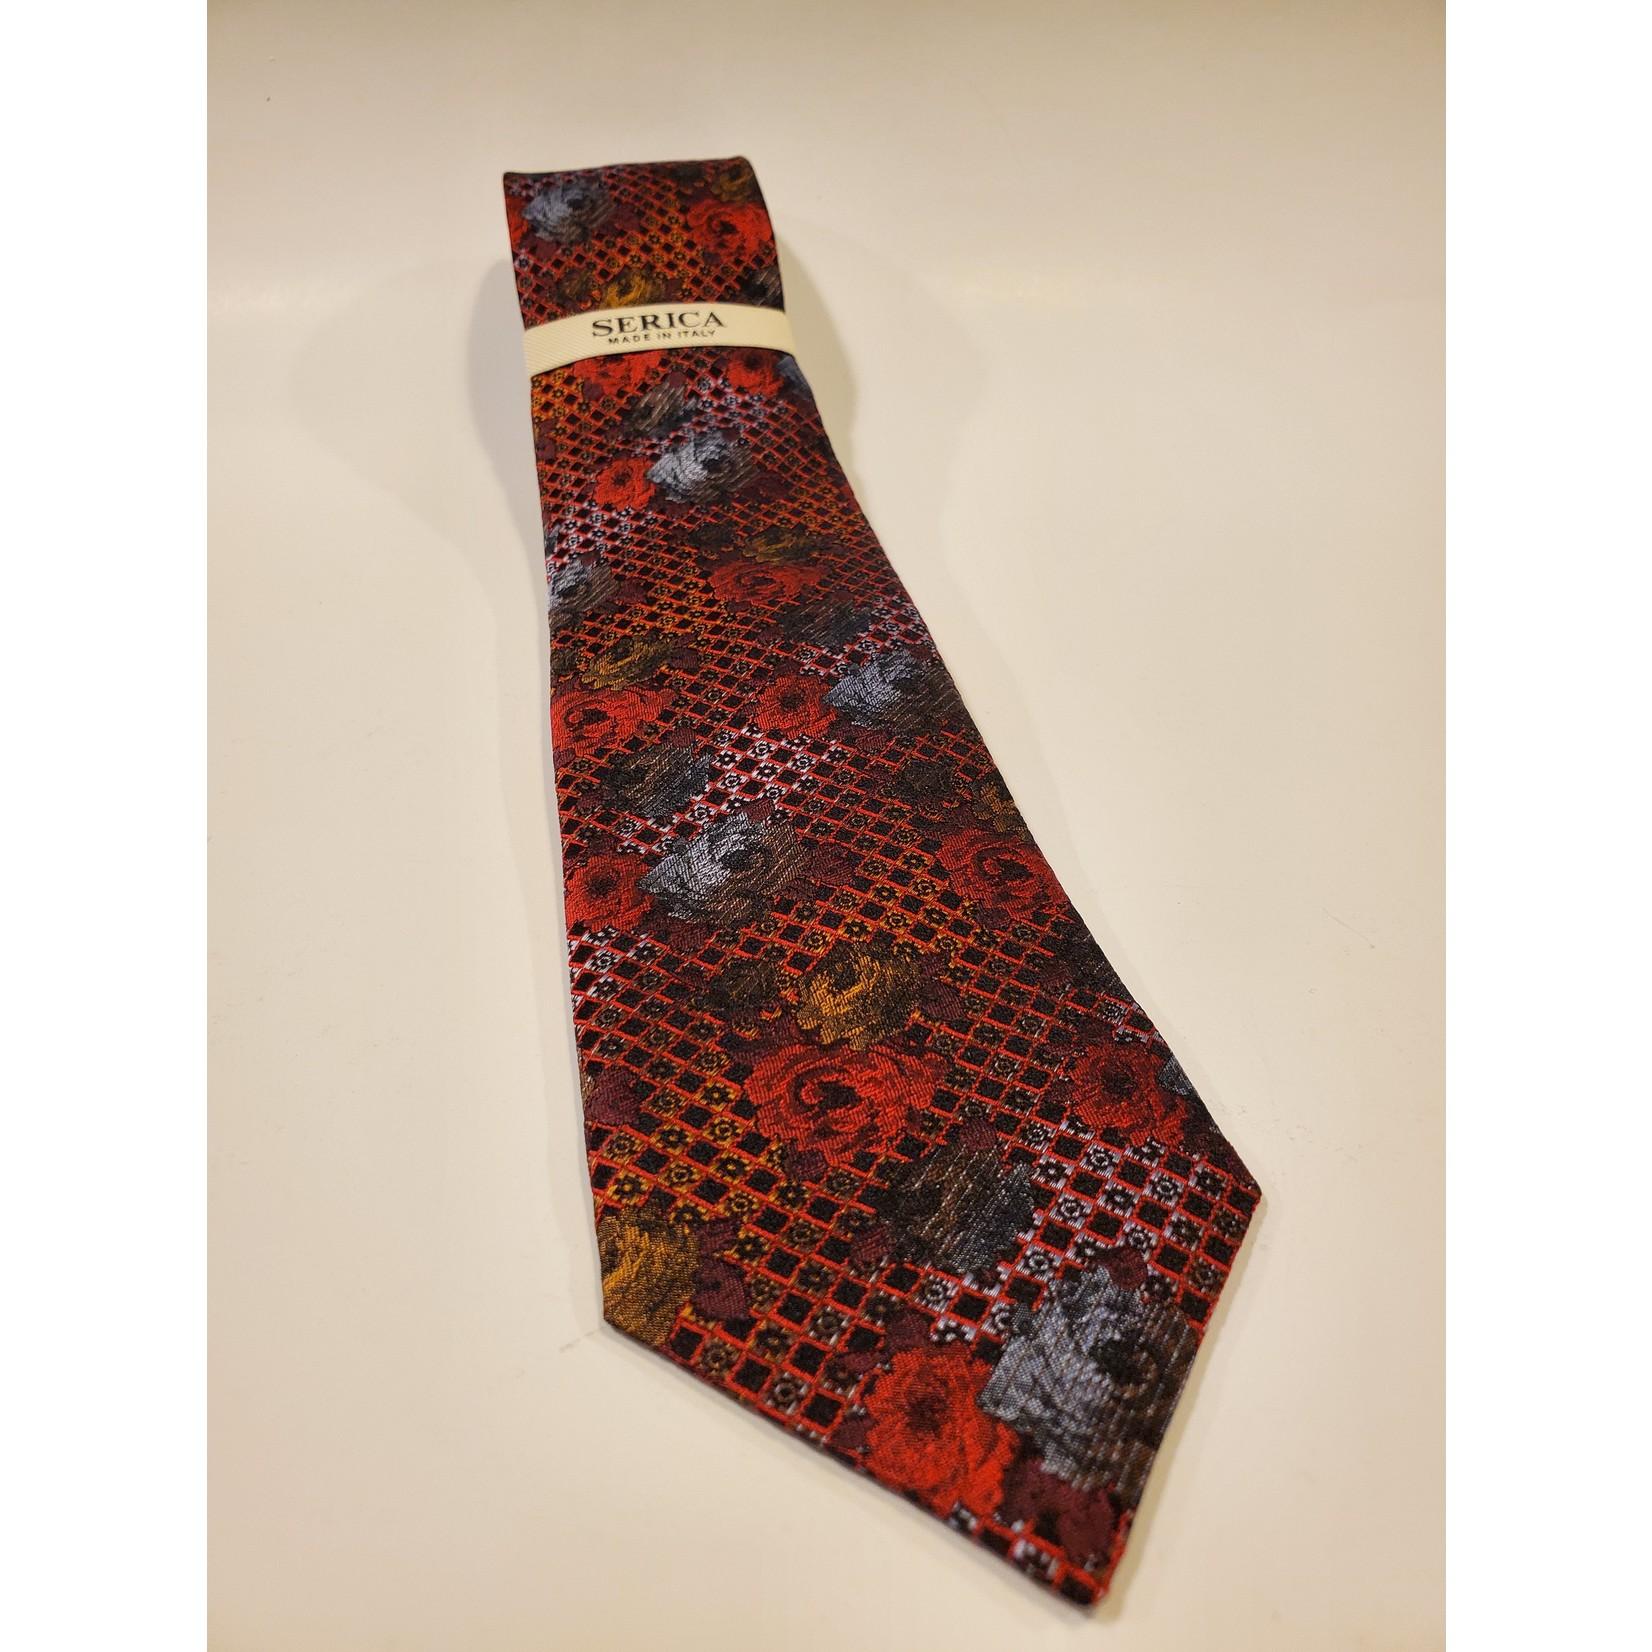 Serica 213215 Jacquard Silk Tie C - Red Floral Checkerboard